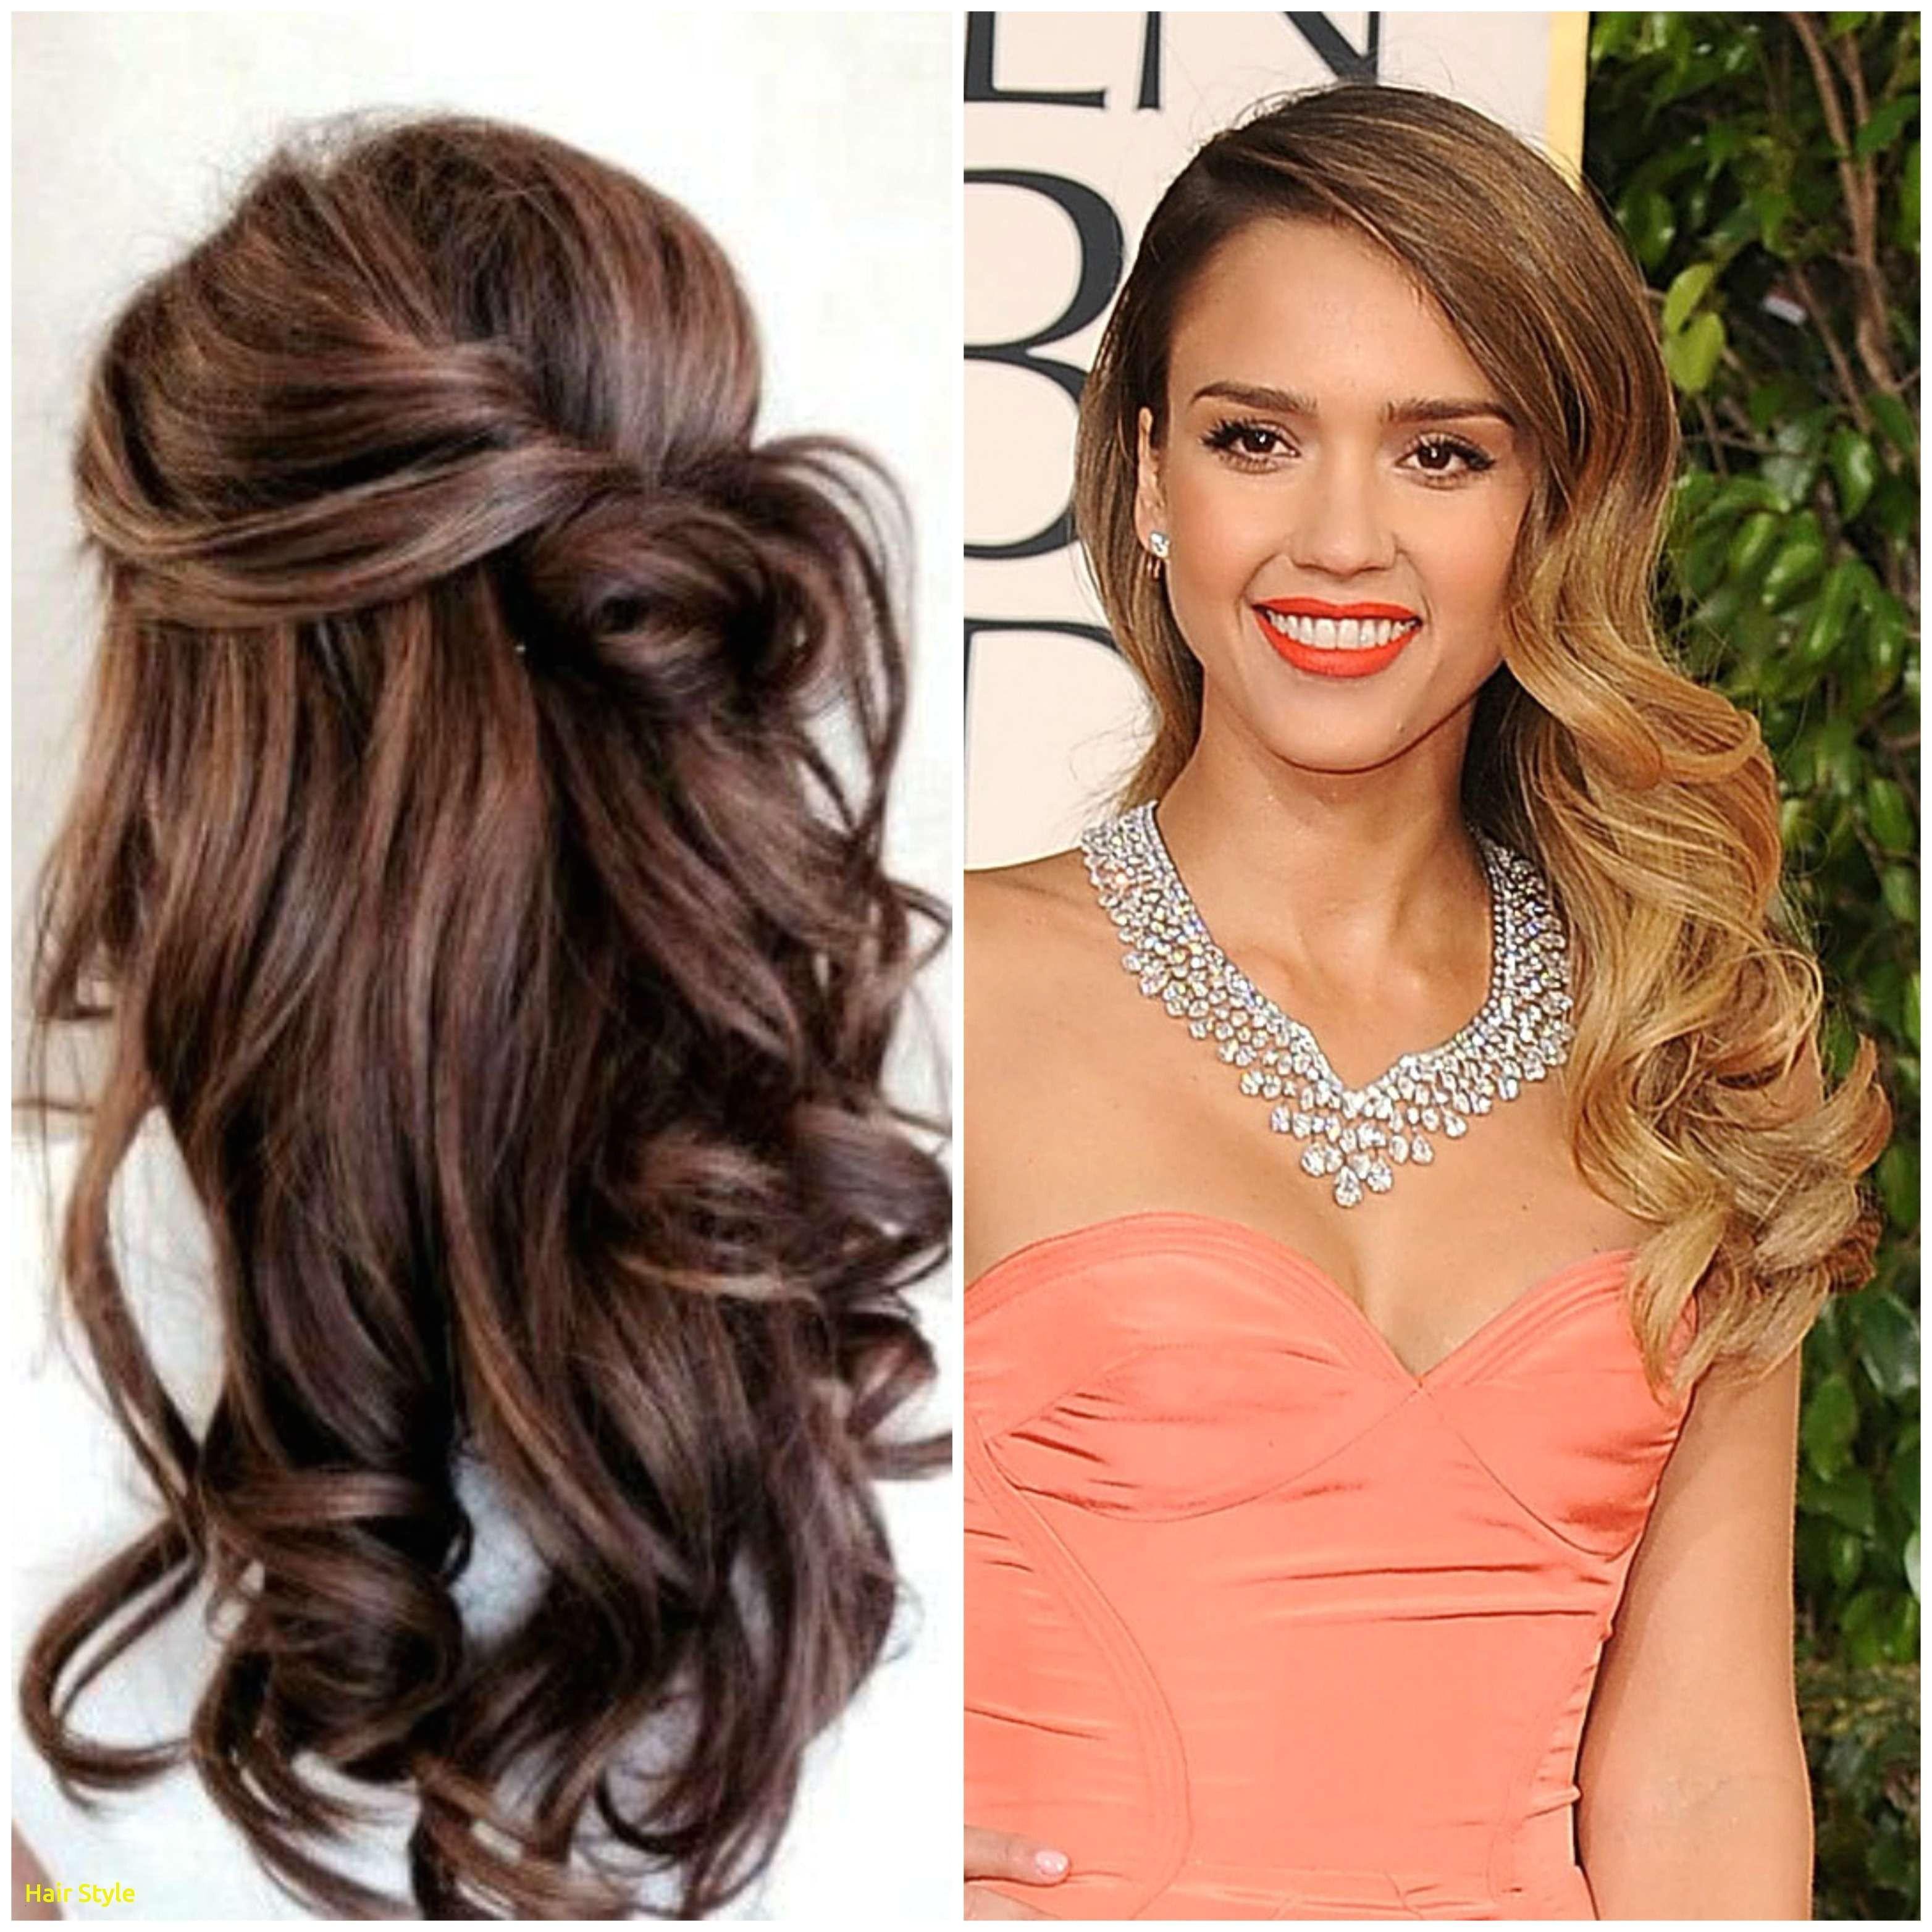 female hairstyles best of luxury hairstyles for long hair 2015 luxury i pinimg 1200x 0d 60 fresh easy diy